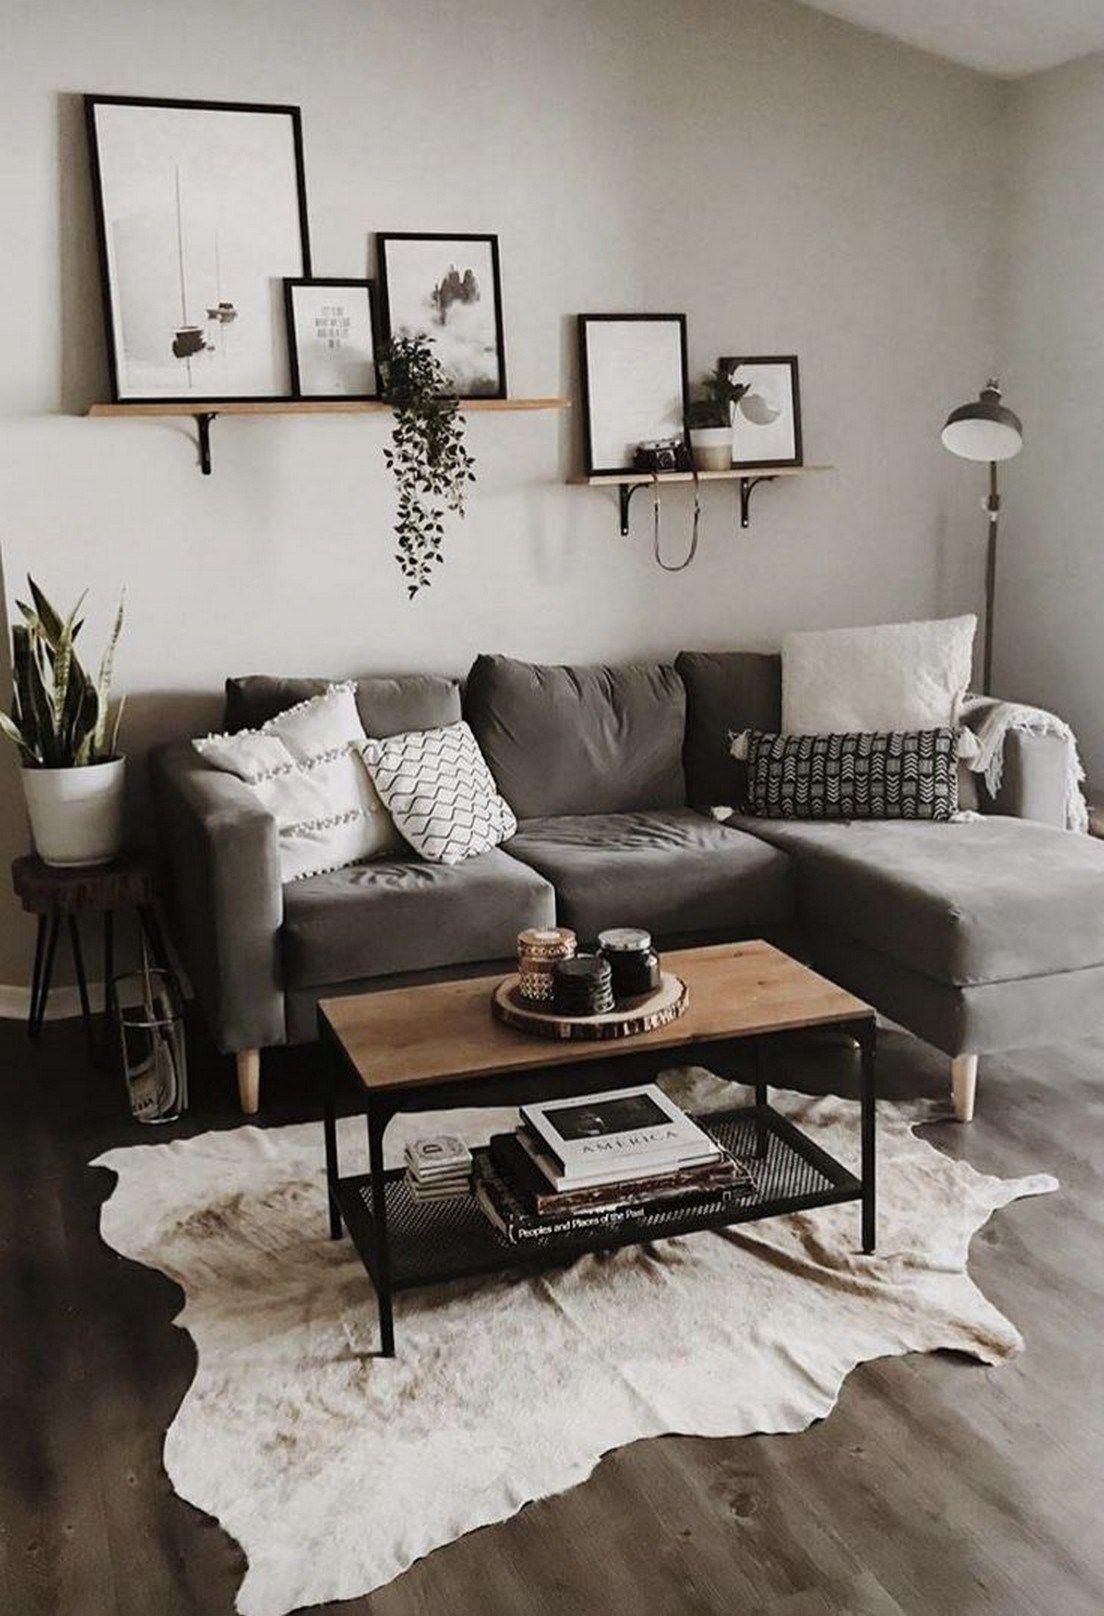 40 Smart Small Apartment Decorating Ideas On A Budget 16 Flat Decor Small Living Room Design Small Living Room Decor